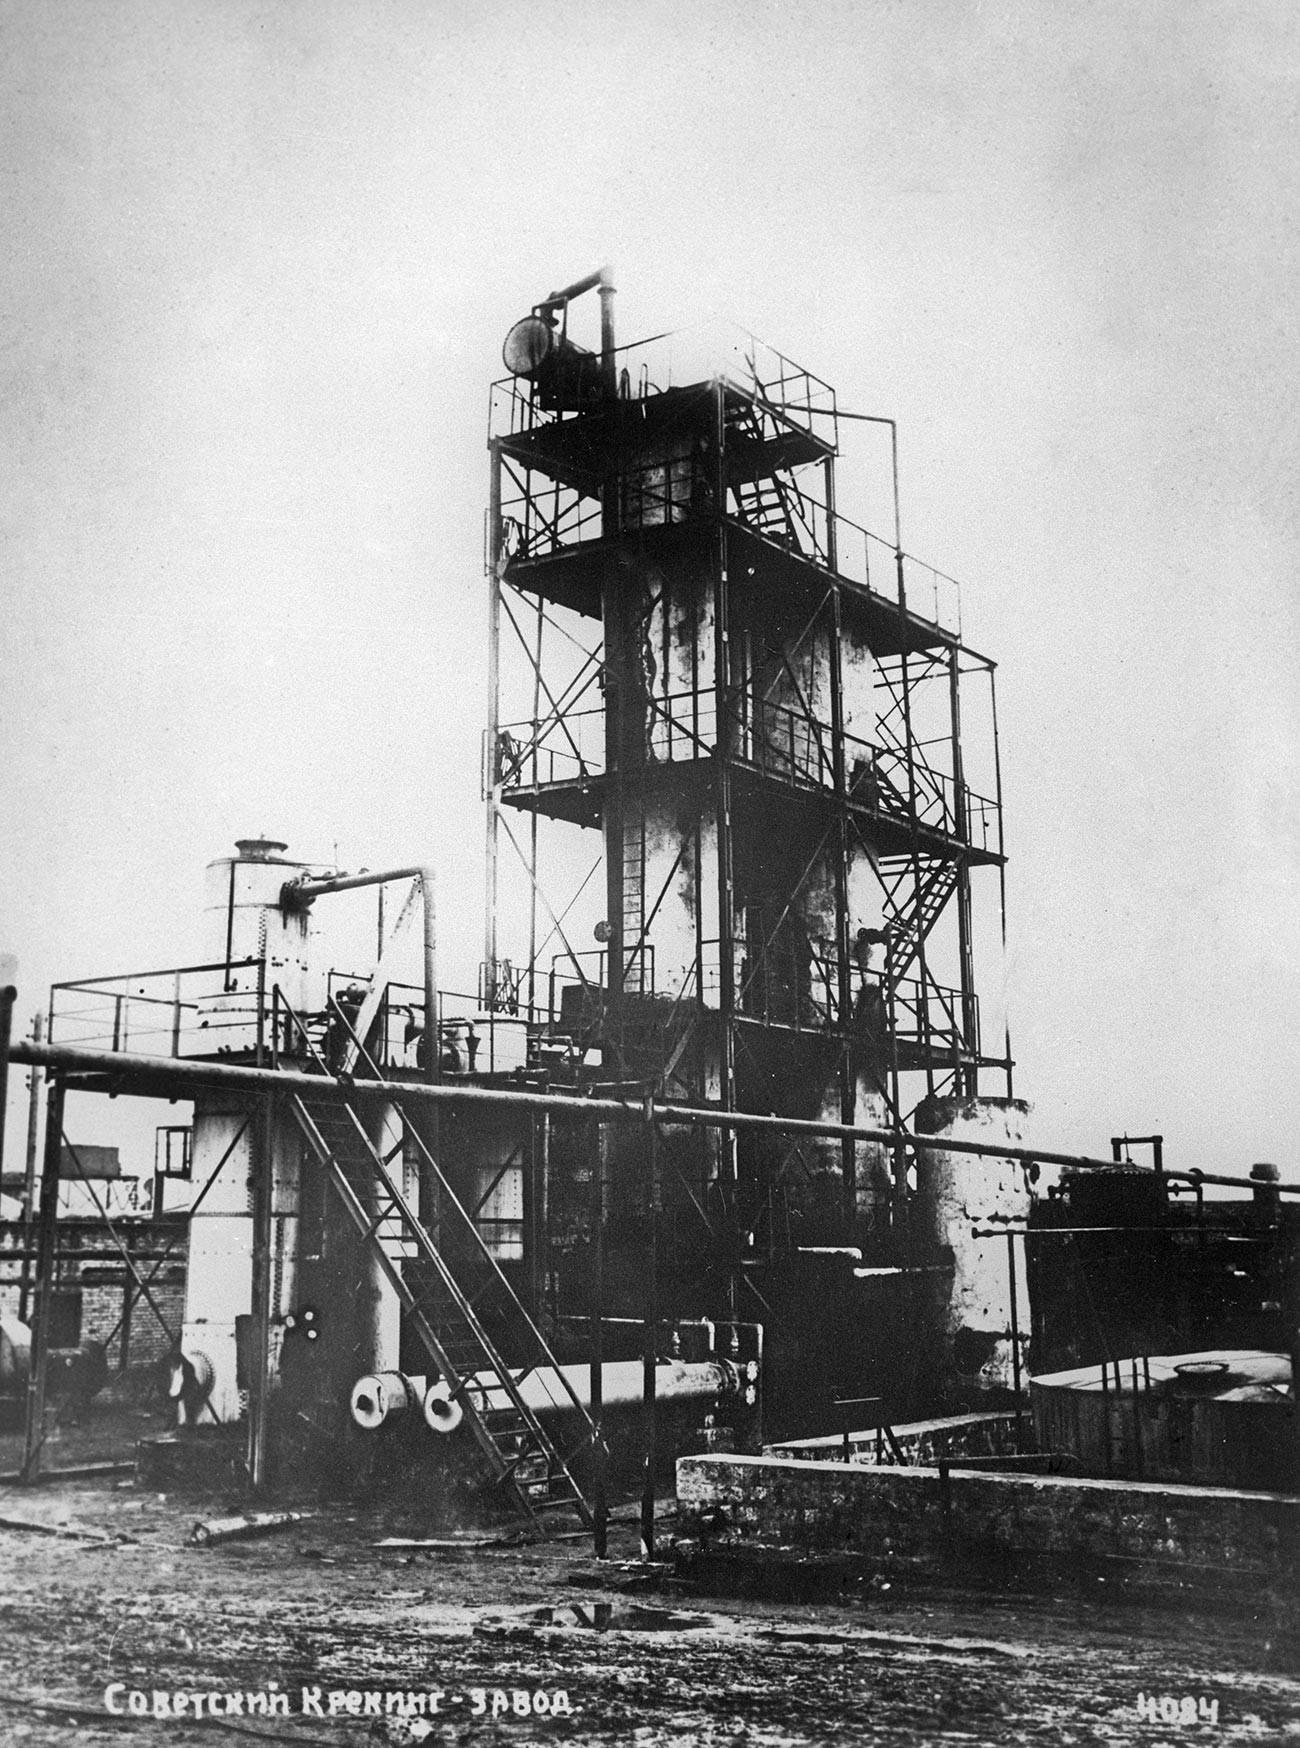 L'impianto di cracking petrolifero costruito a Baku da Shukhov, 1934